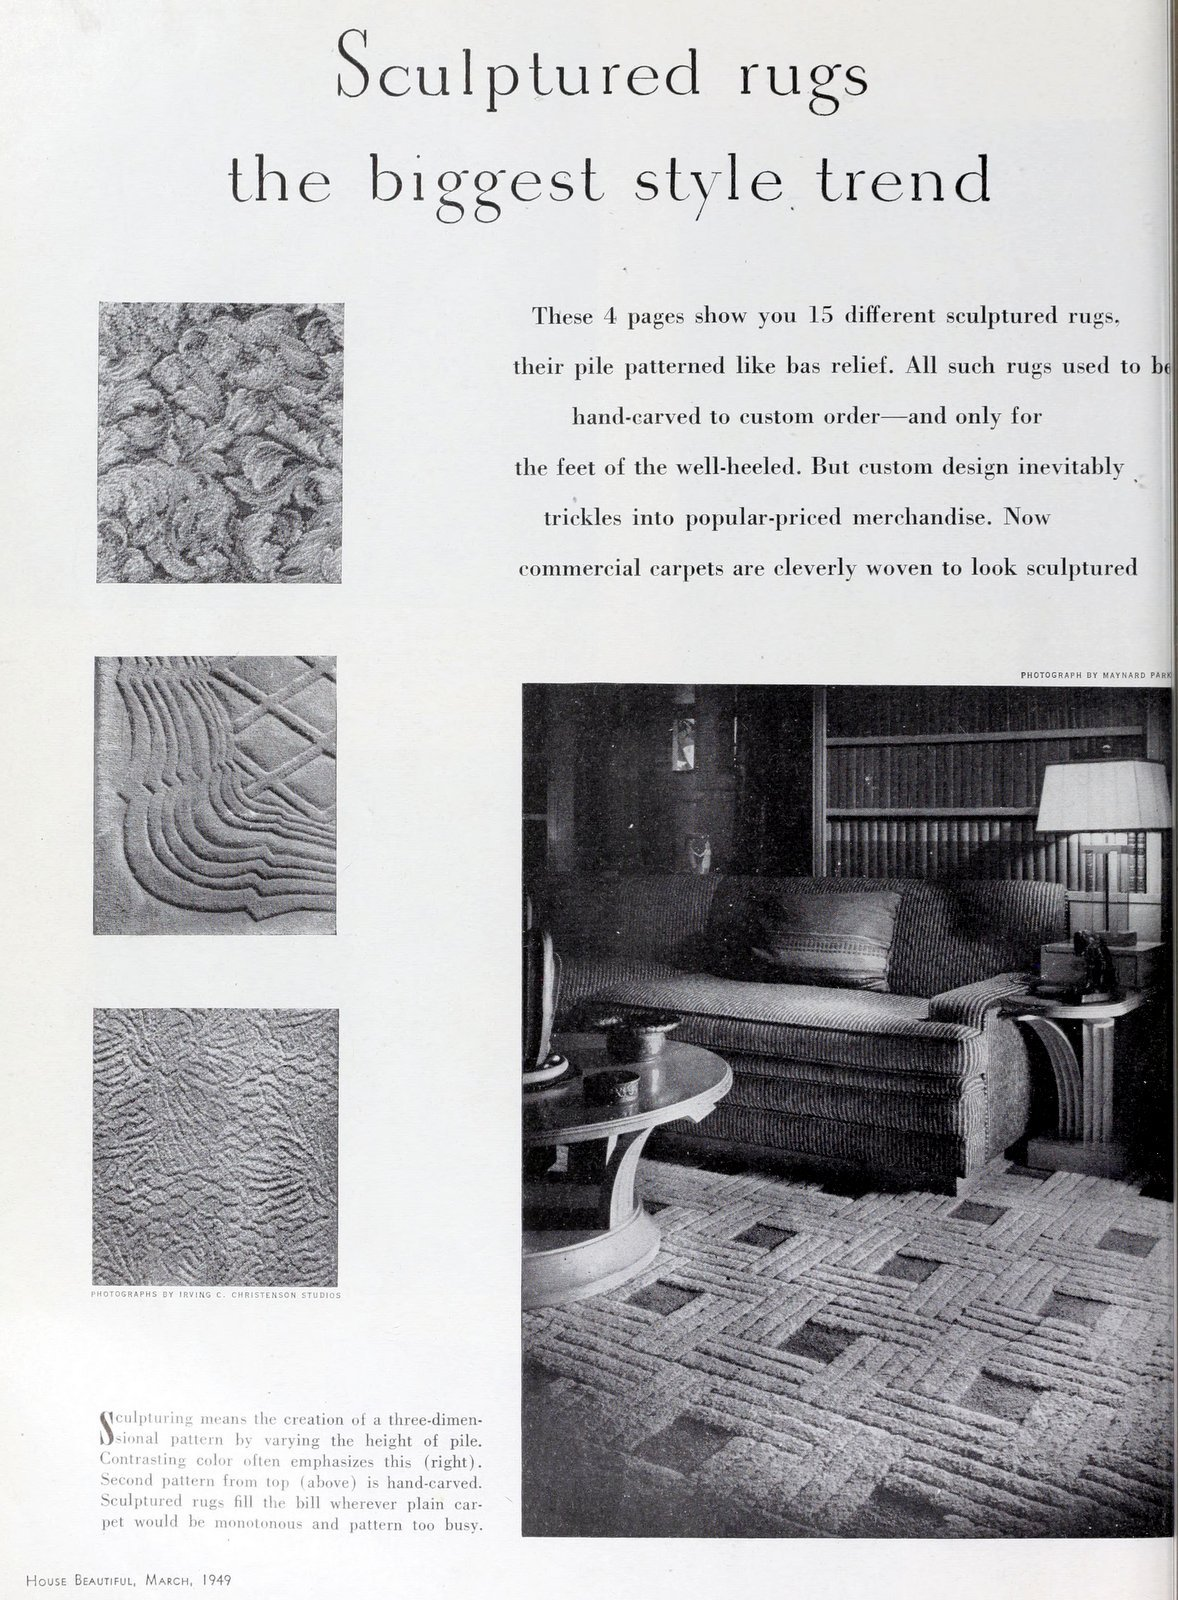 Scuptured rug styles (1949)